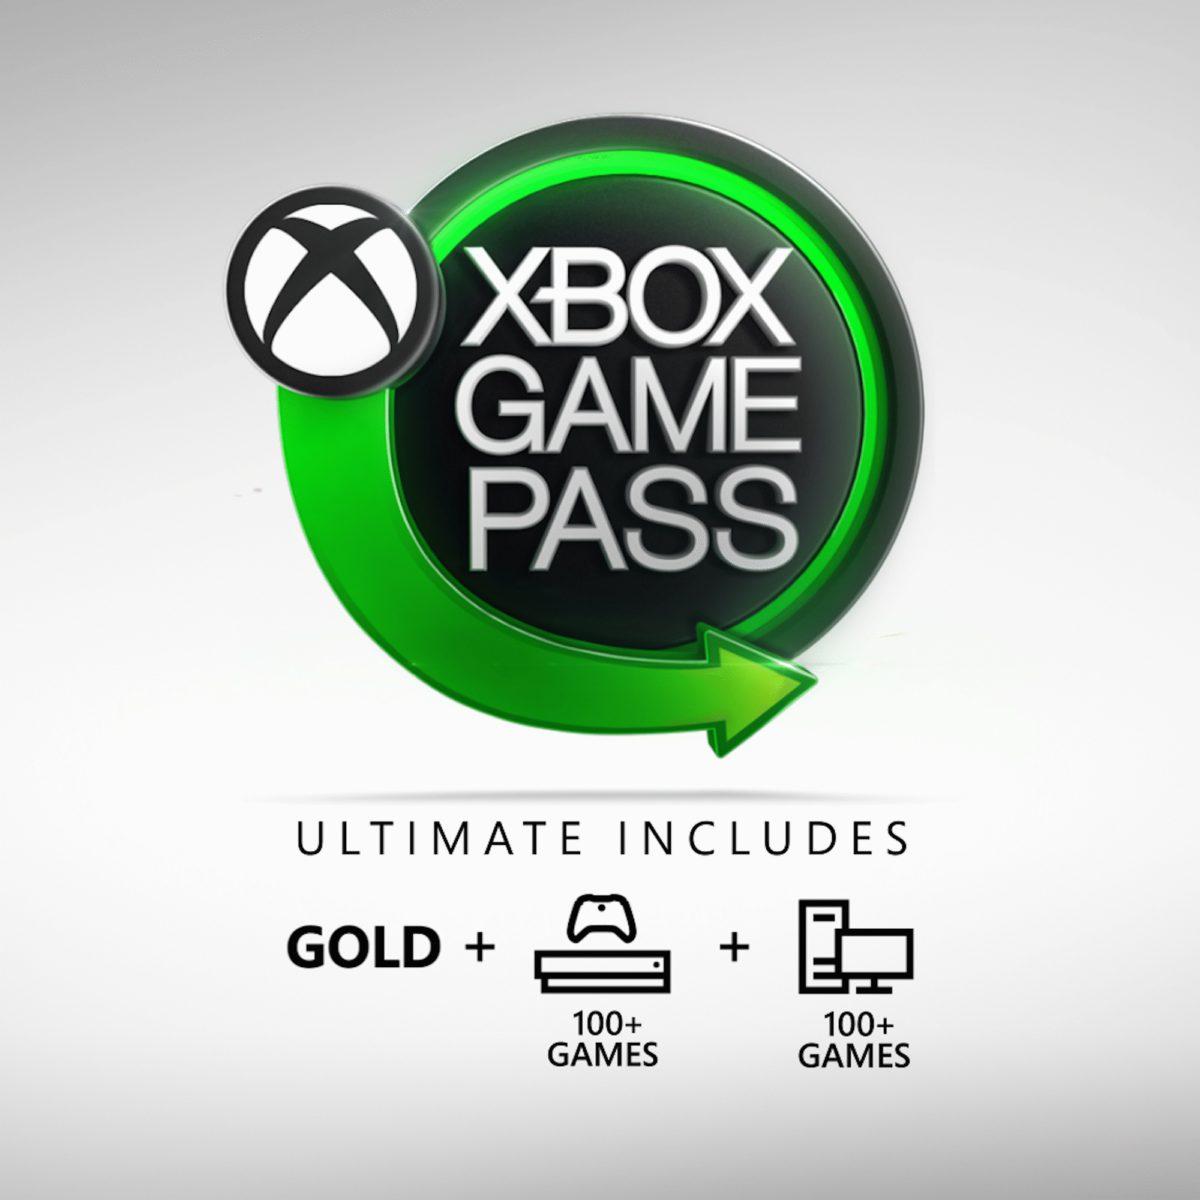 Xbox Game Pass Ultimate 可以遊玩過百款Xbox 遊戲。